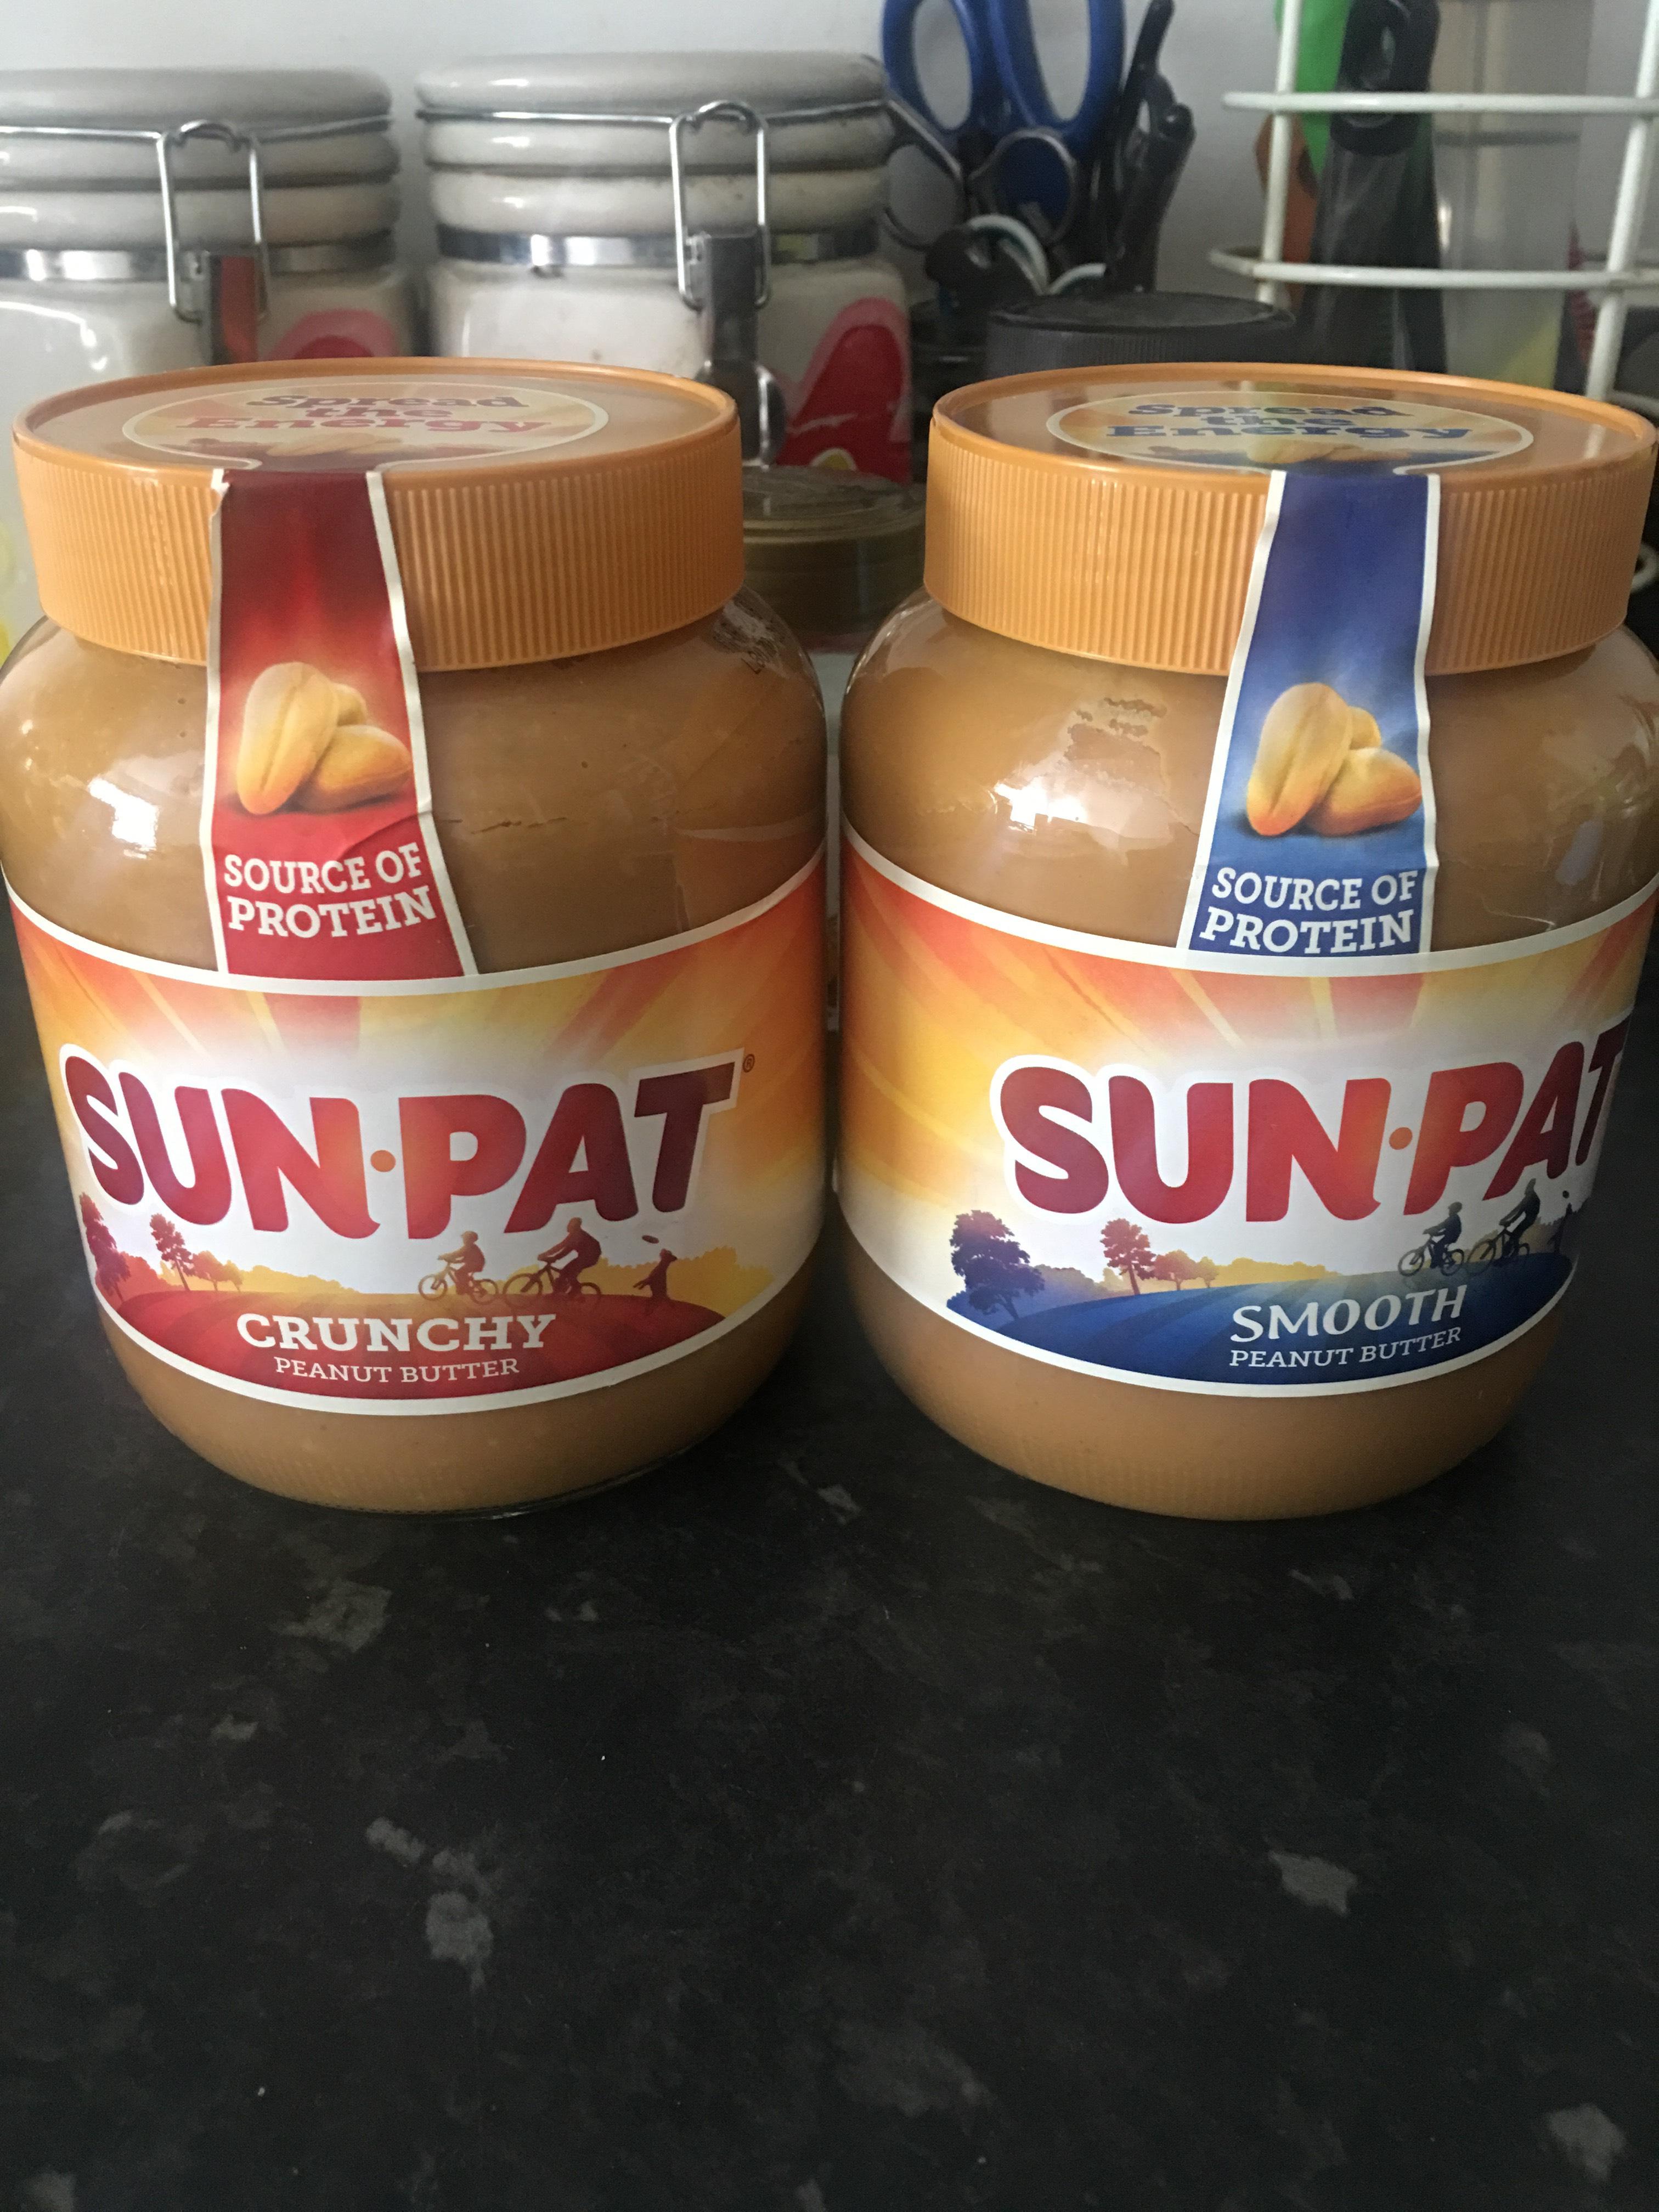 Sun Pat Peanut Butter 700g reduced £1 INSTORE Asda Burnden Park